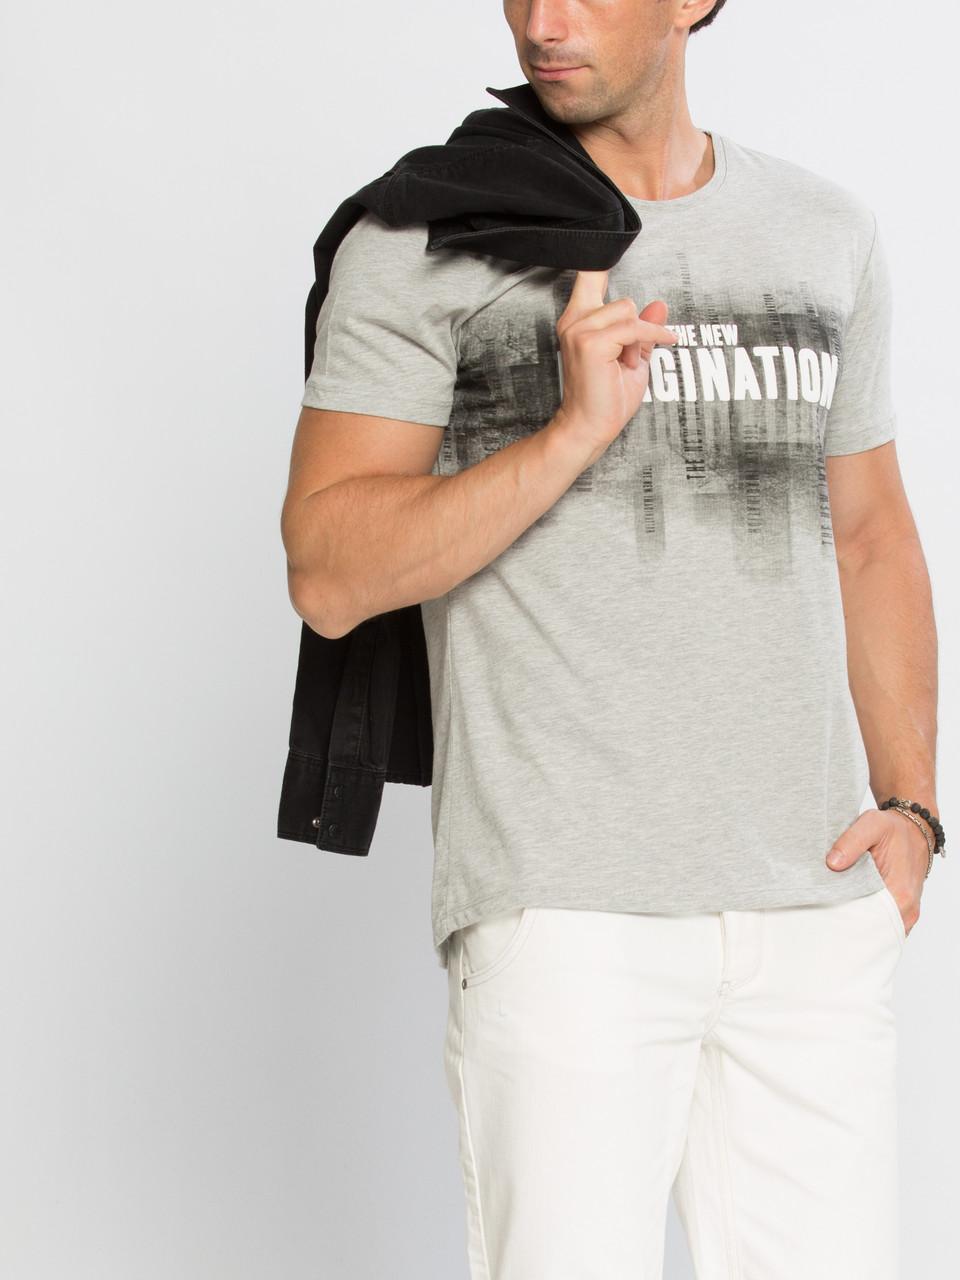 Серая мужская футболка LC Waikiki / ЛС Вайкики с надписью The New Imagination